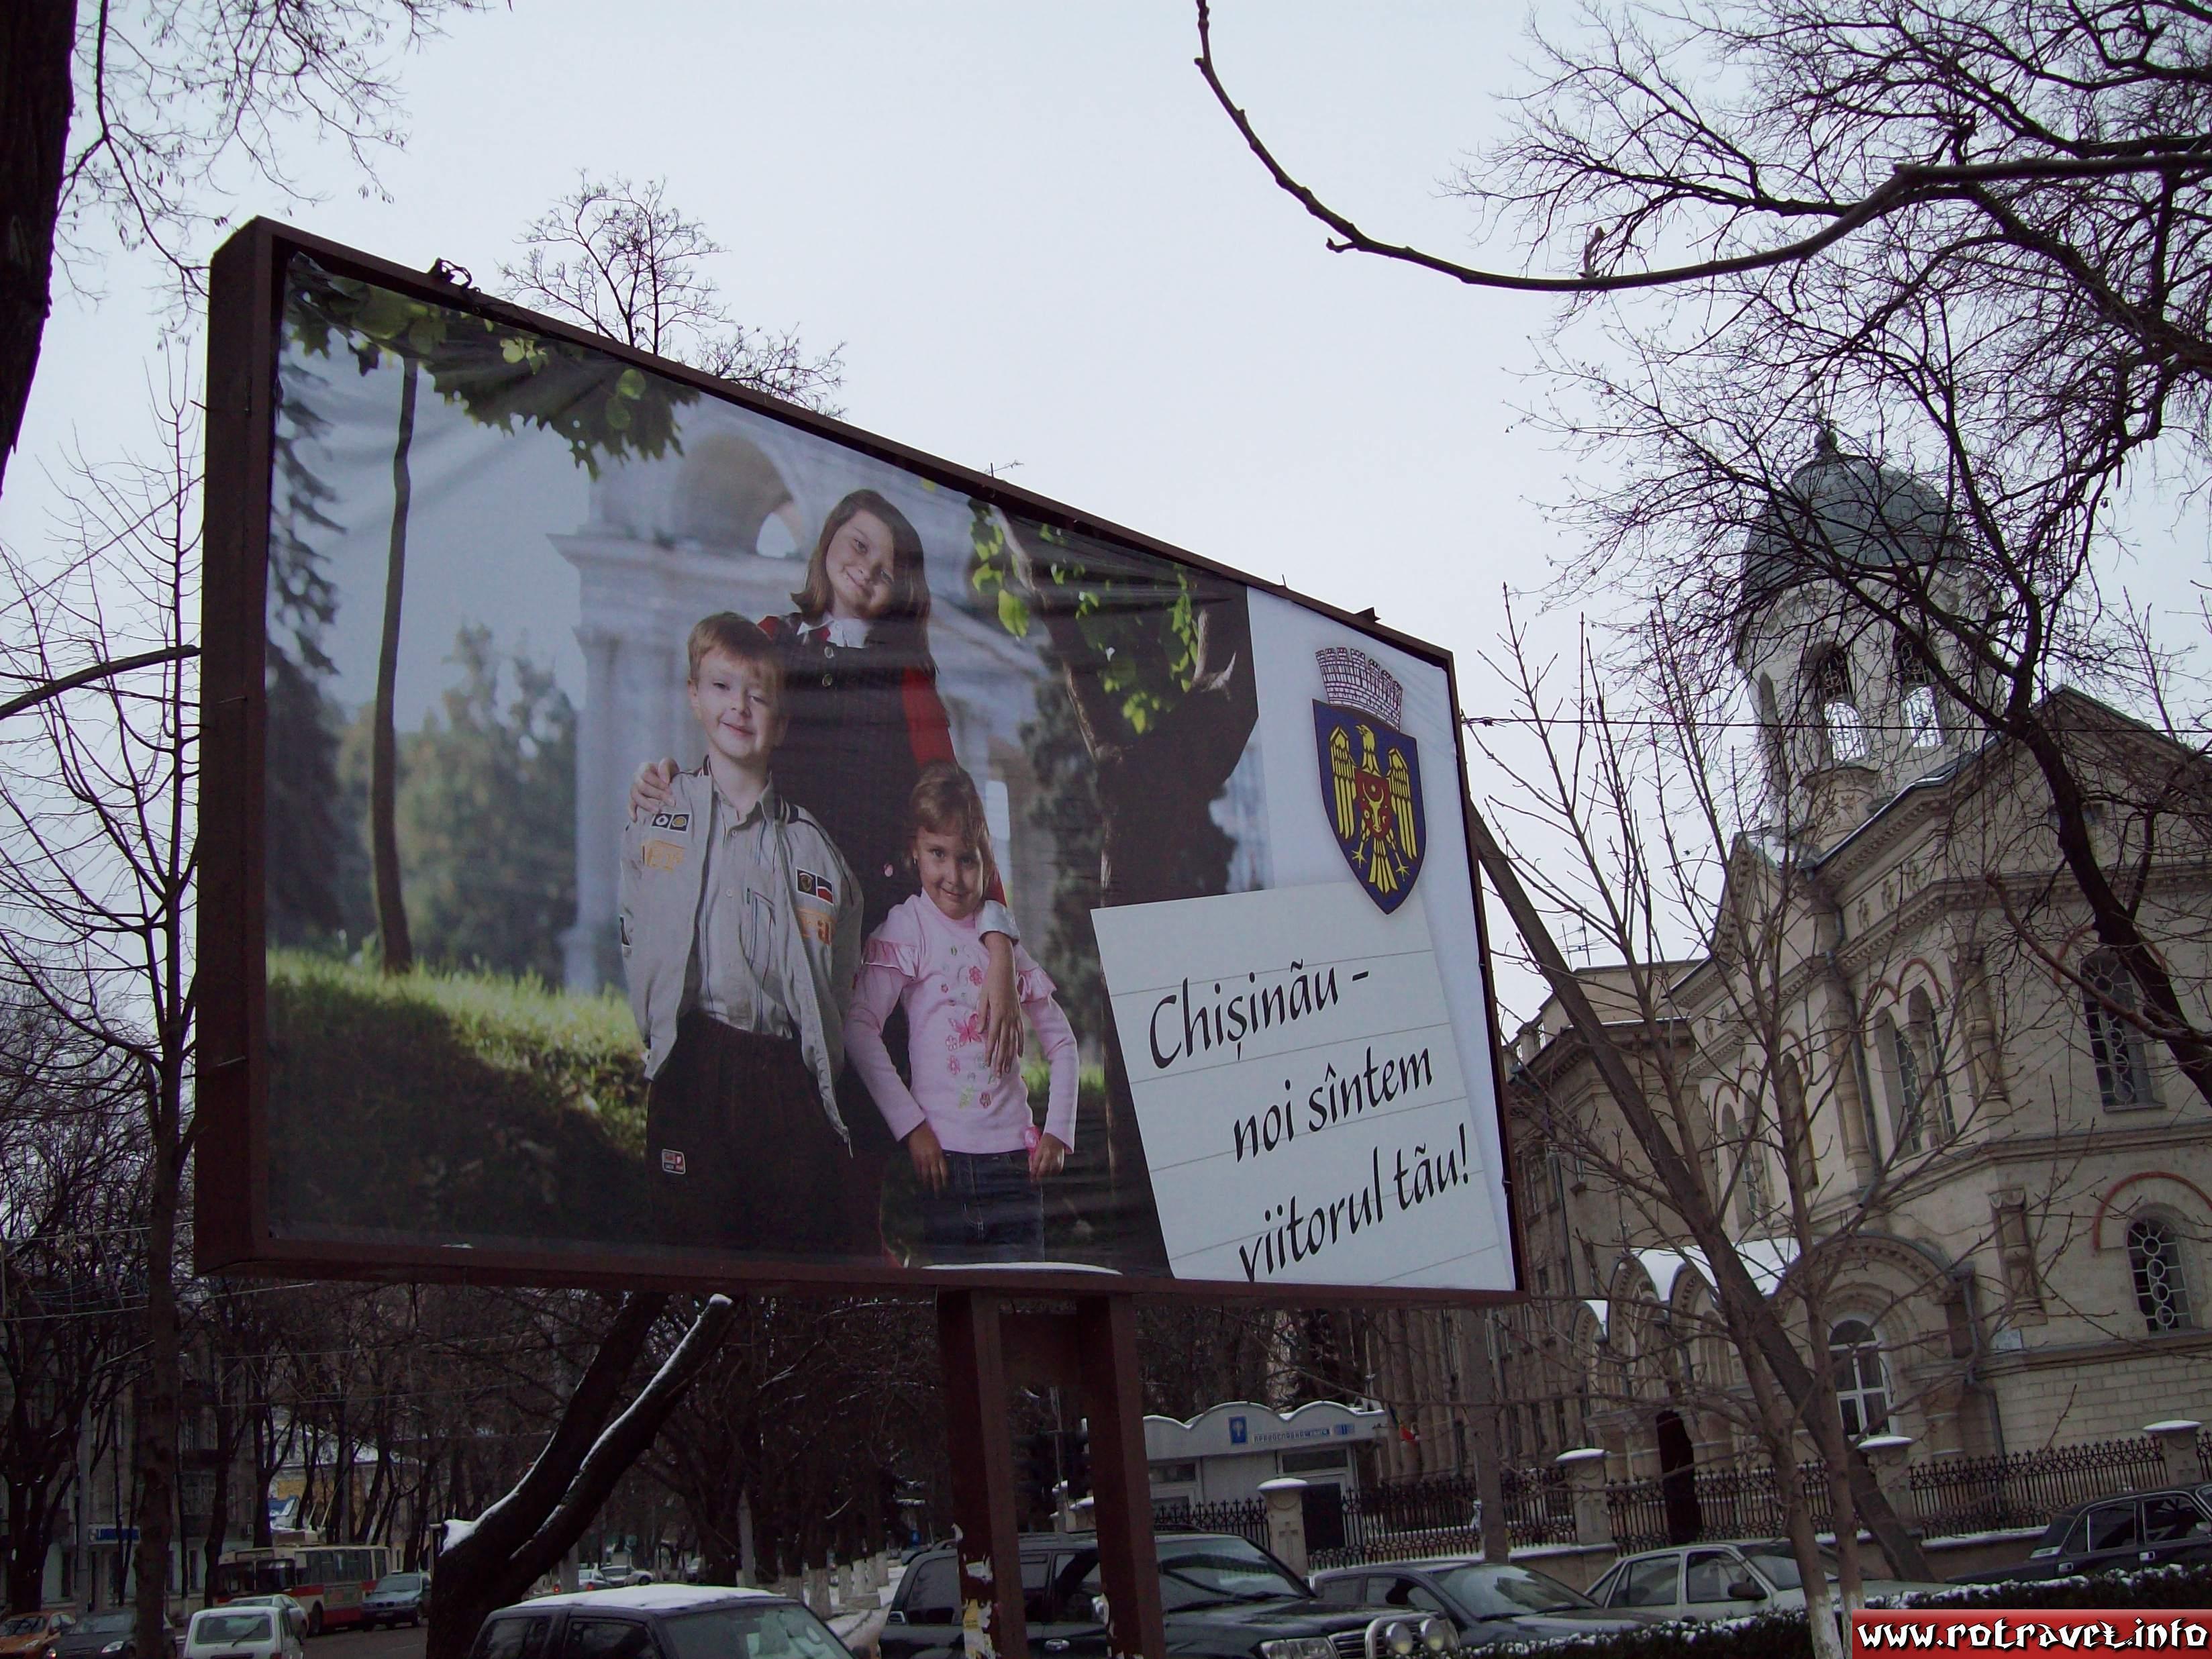 "A panel with the message ""Chisinau - noi suntem viitorul tau!"" put by the mayor of the city, Dorin Chirtoaca"